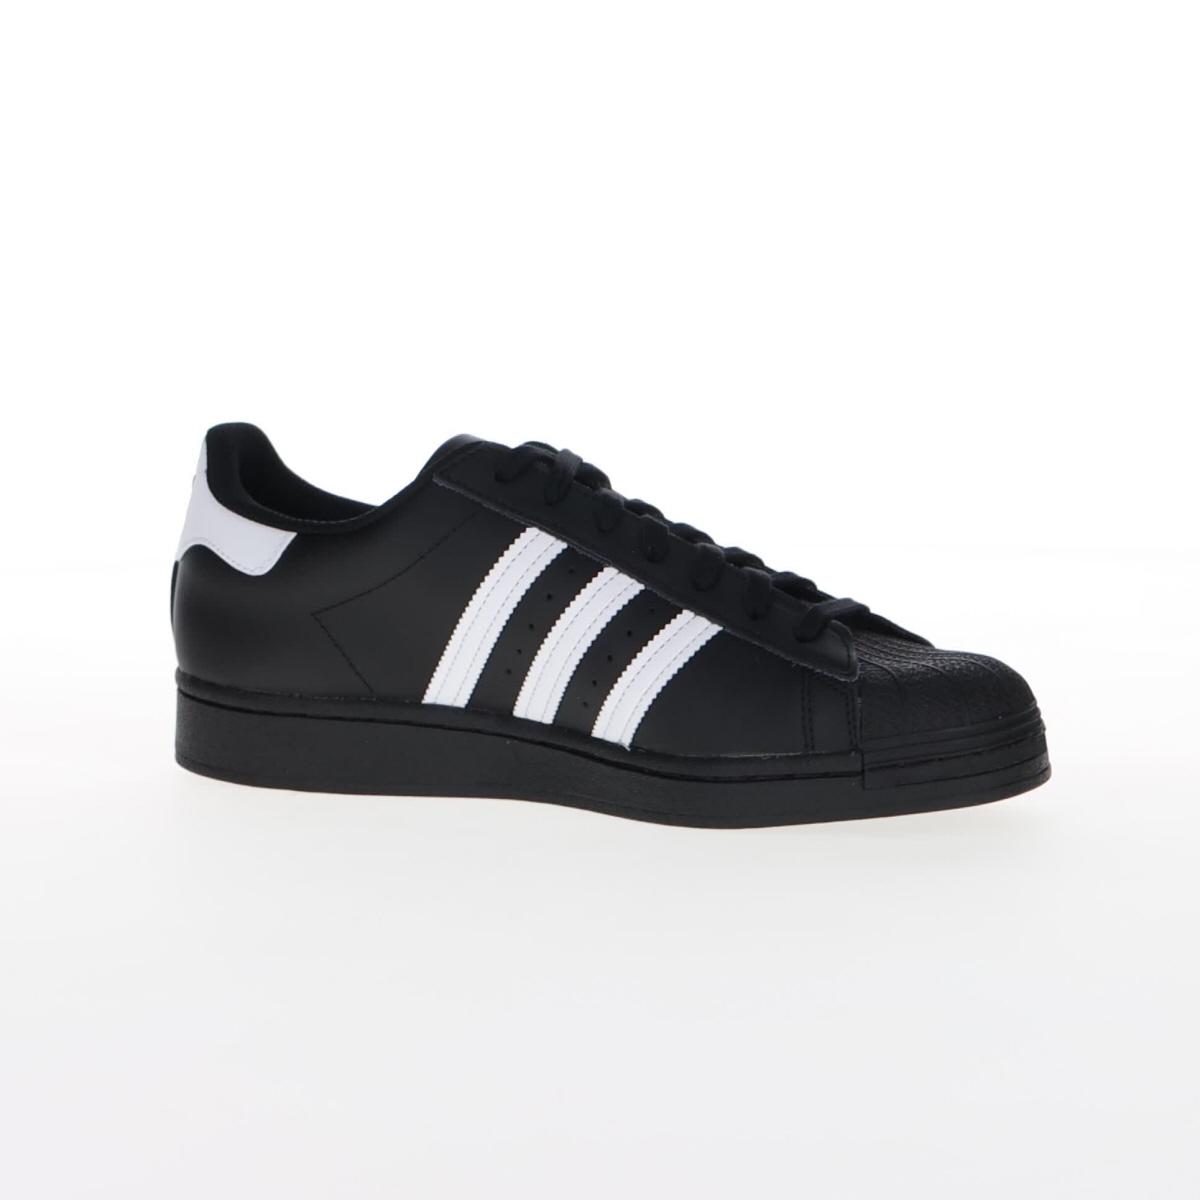 adidas nemeziz black indoor soccer jersey